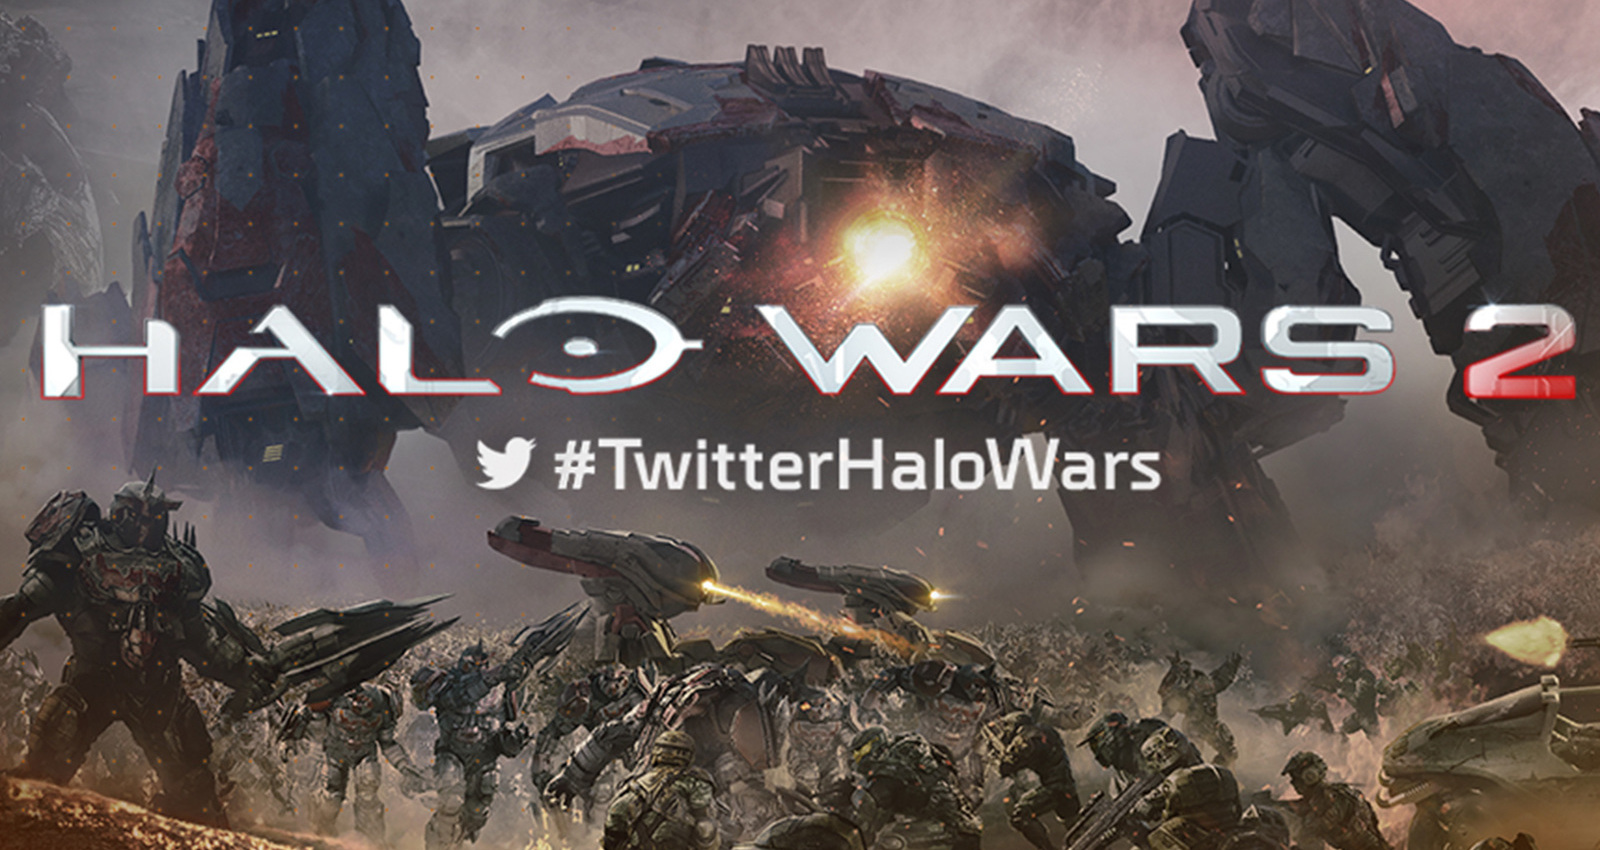 #TwitterHaloWars